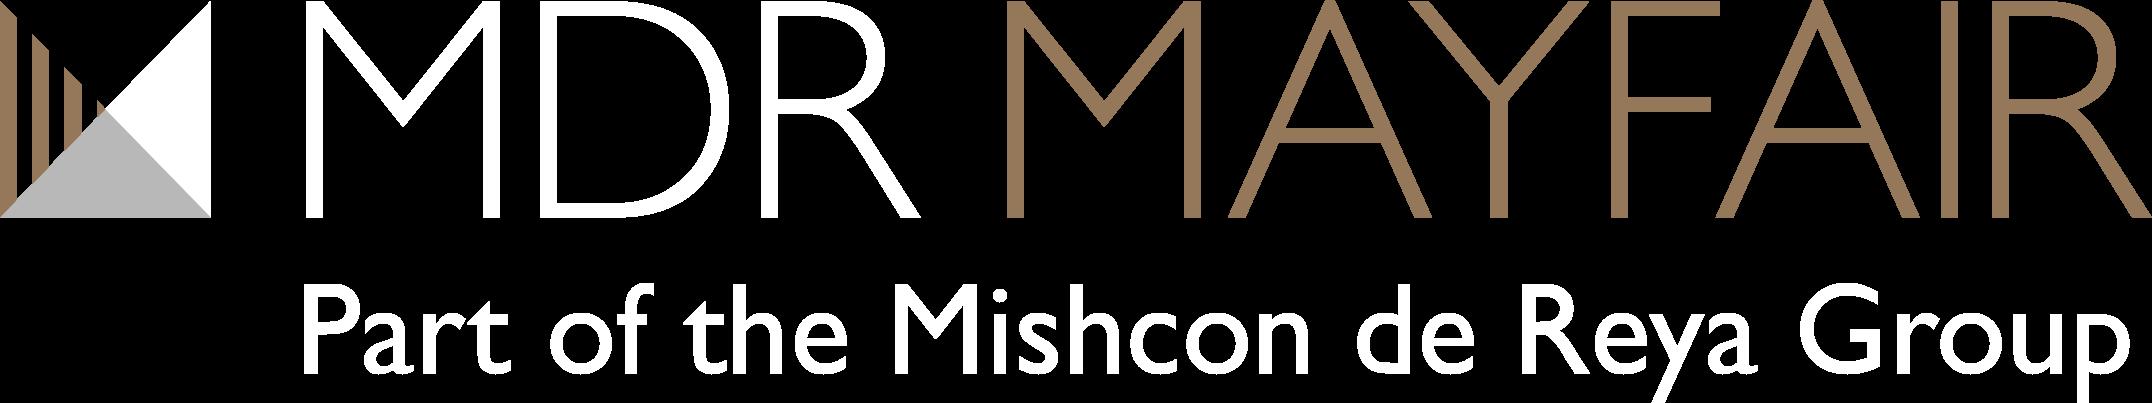 MDR Mayfair